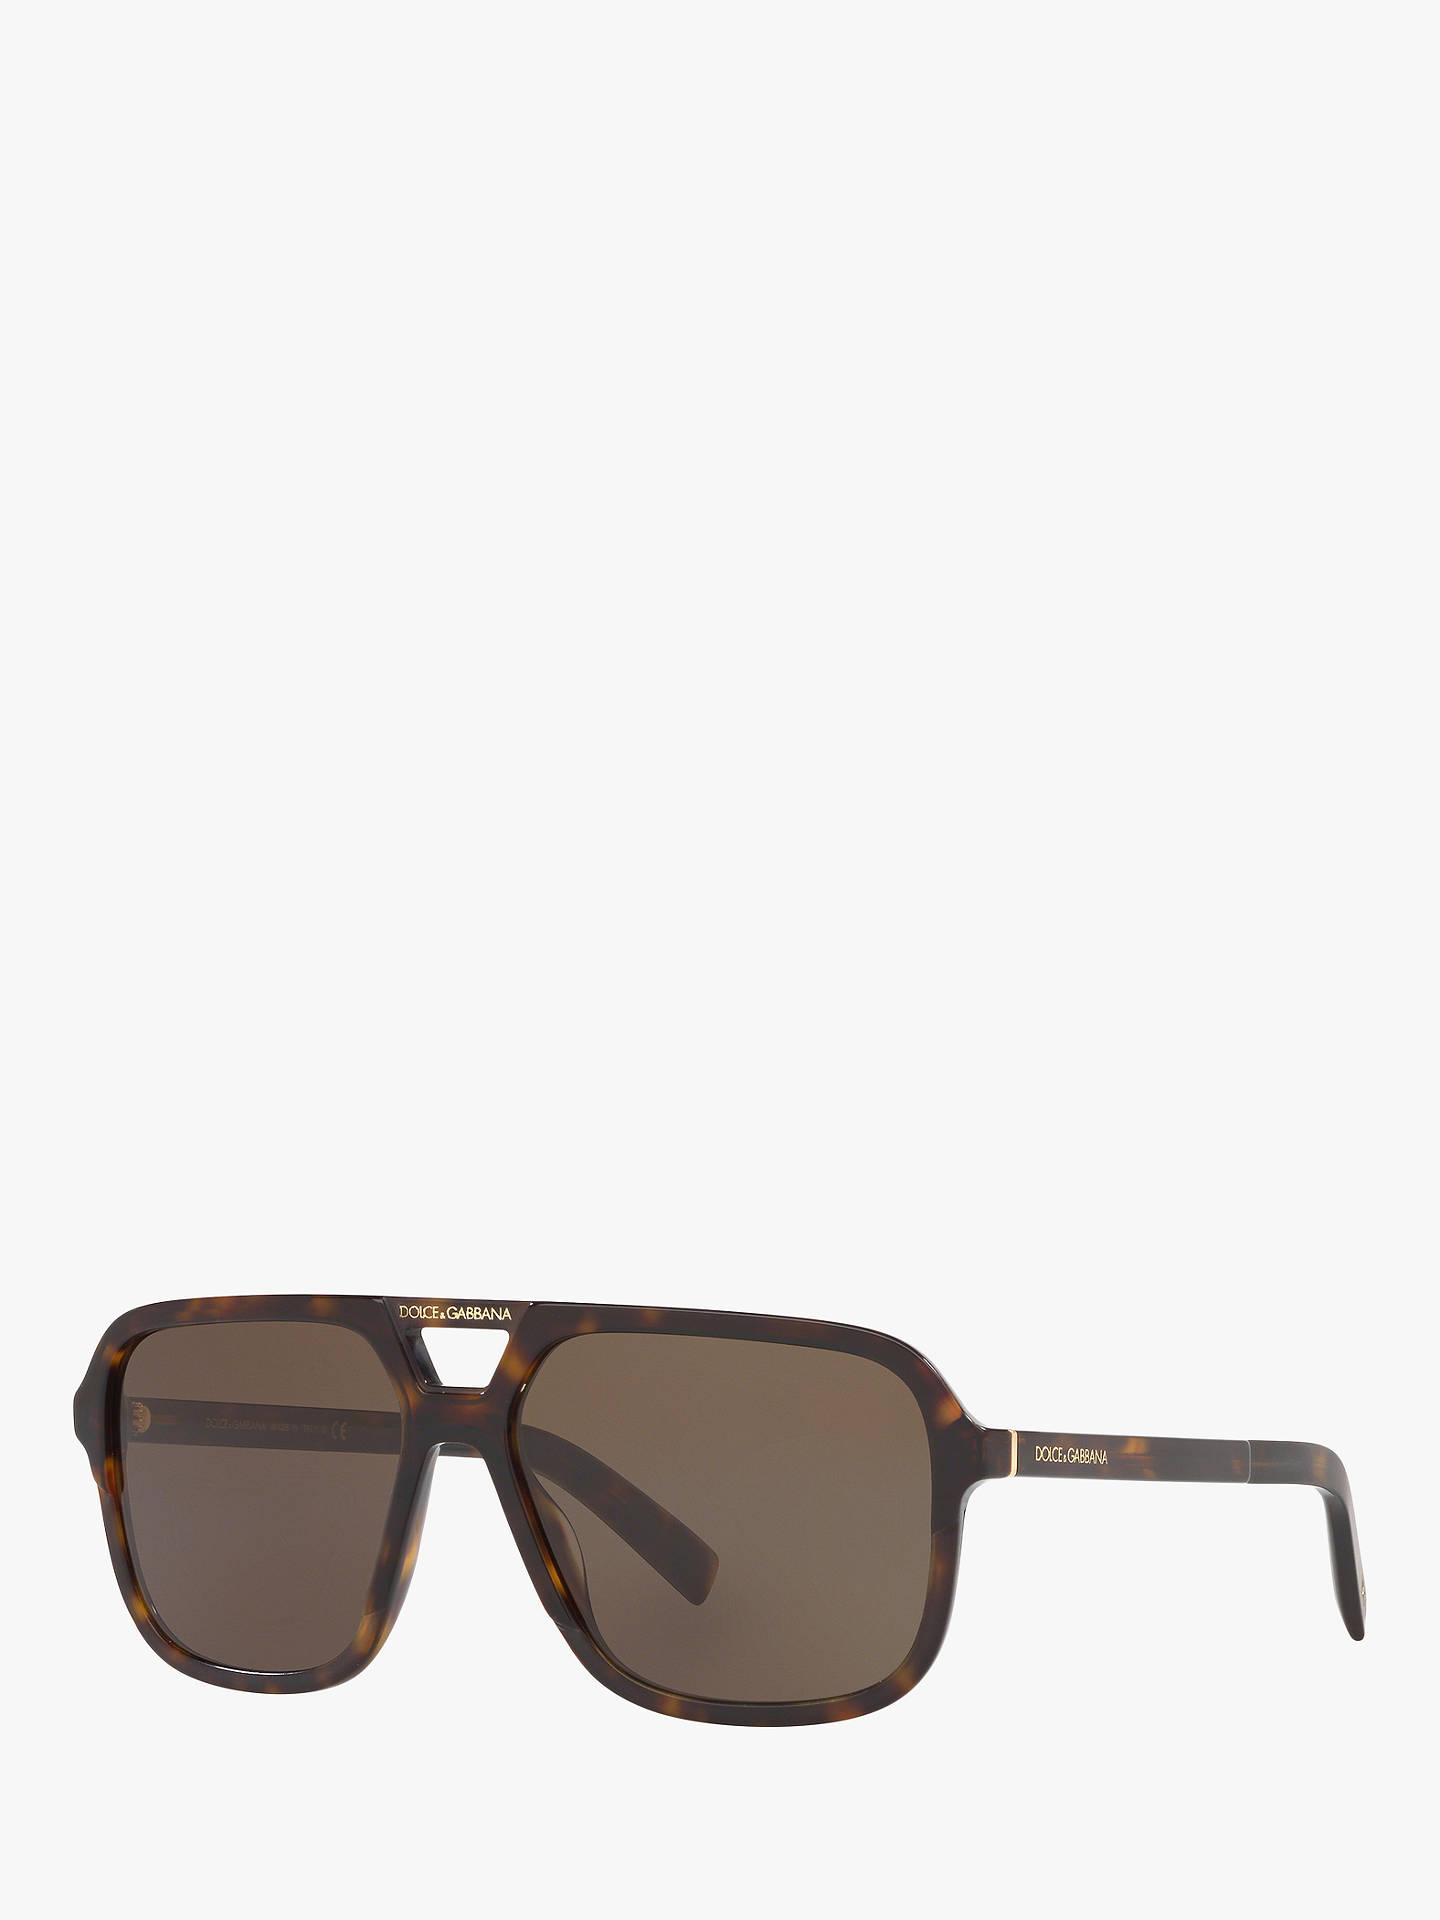 5918c2744 Buy Dolce & Gabbana DG4354 Women's Aviator Sunglasses, Brown/Brown Online  at johnlewis.